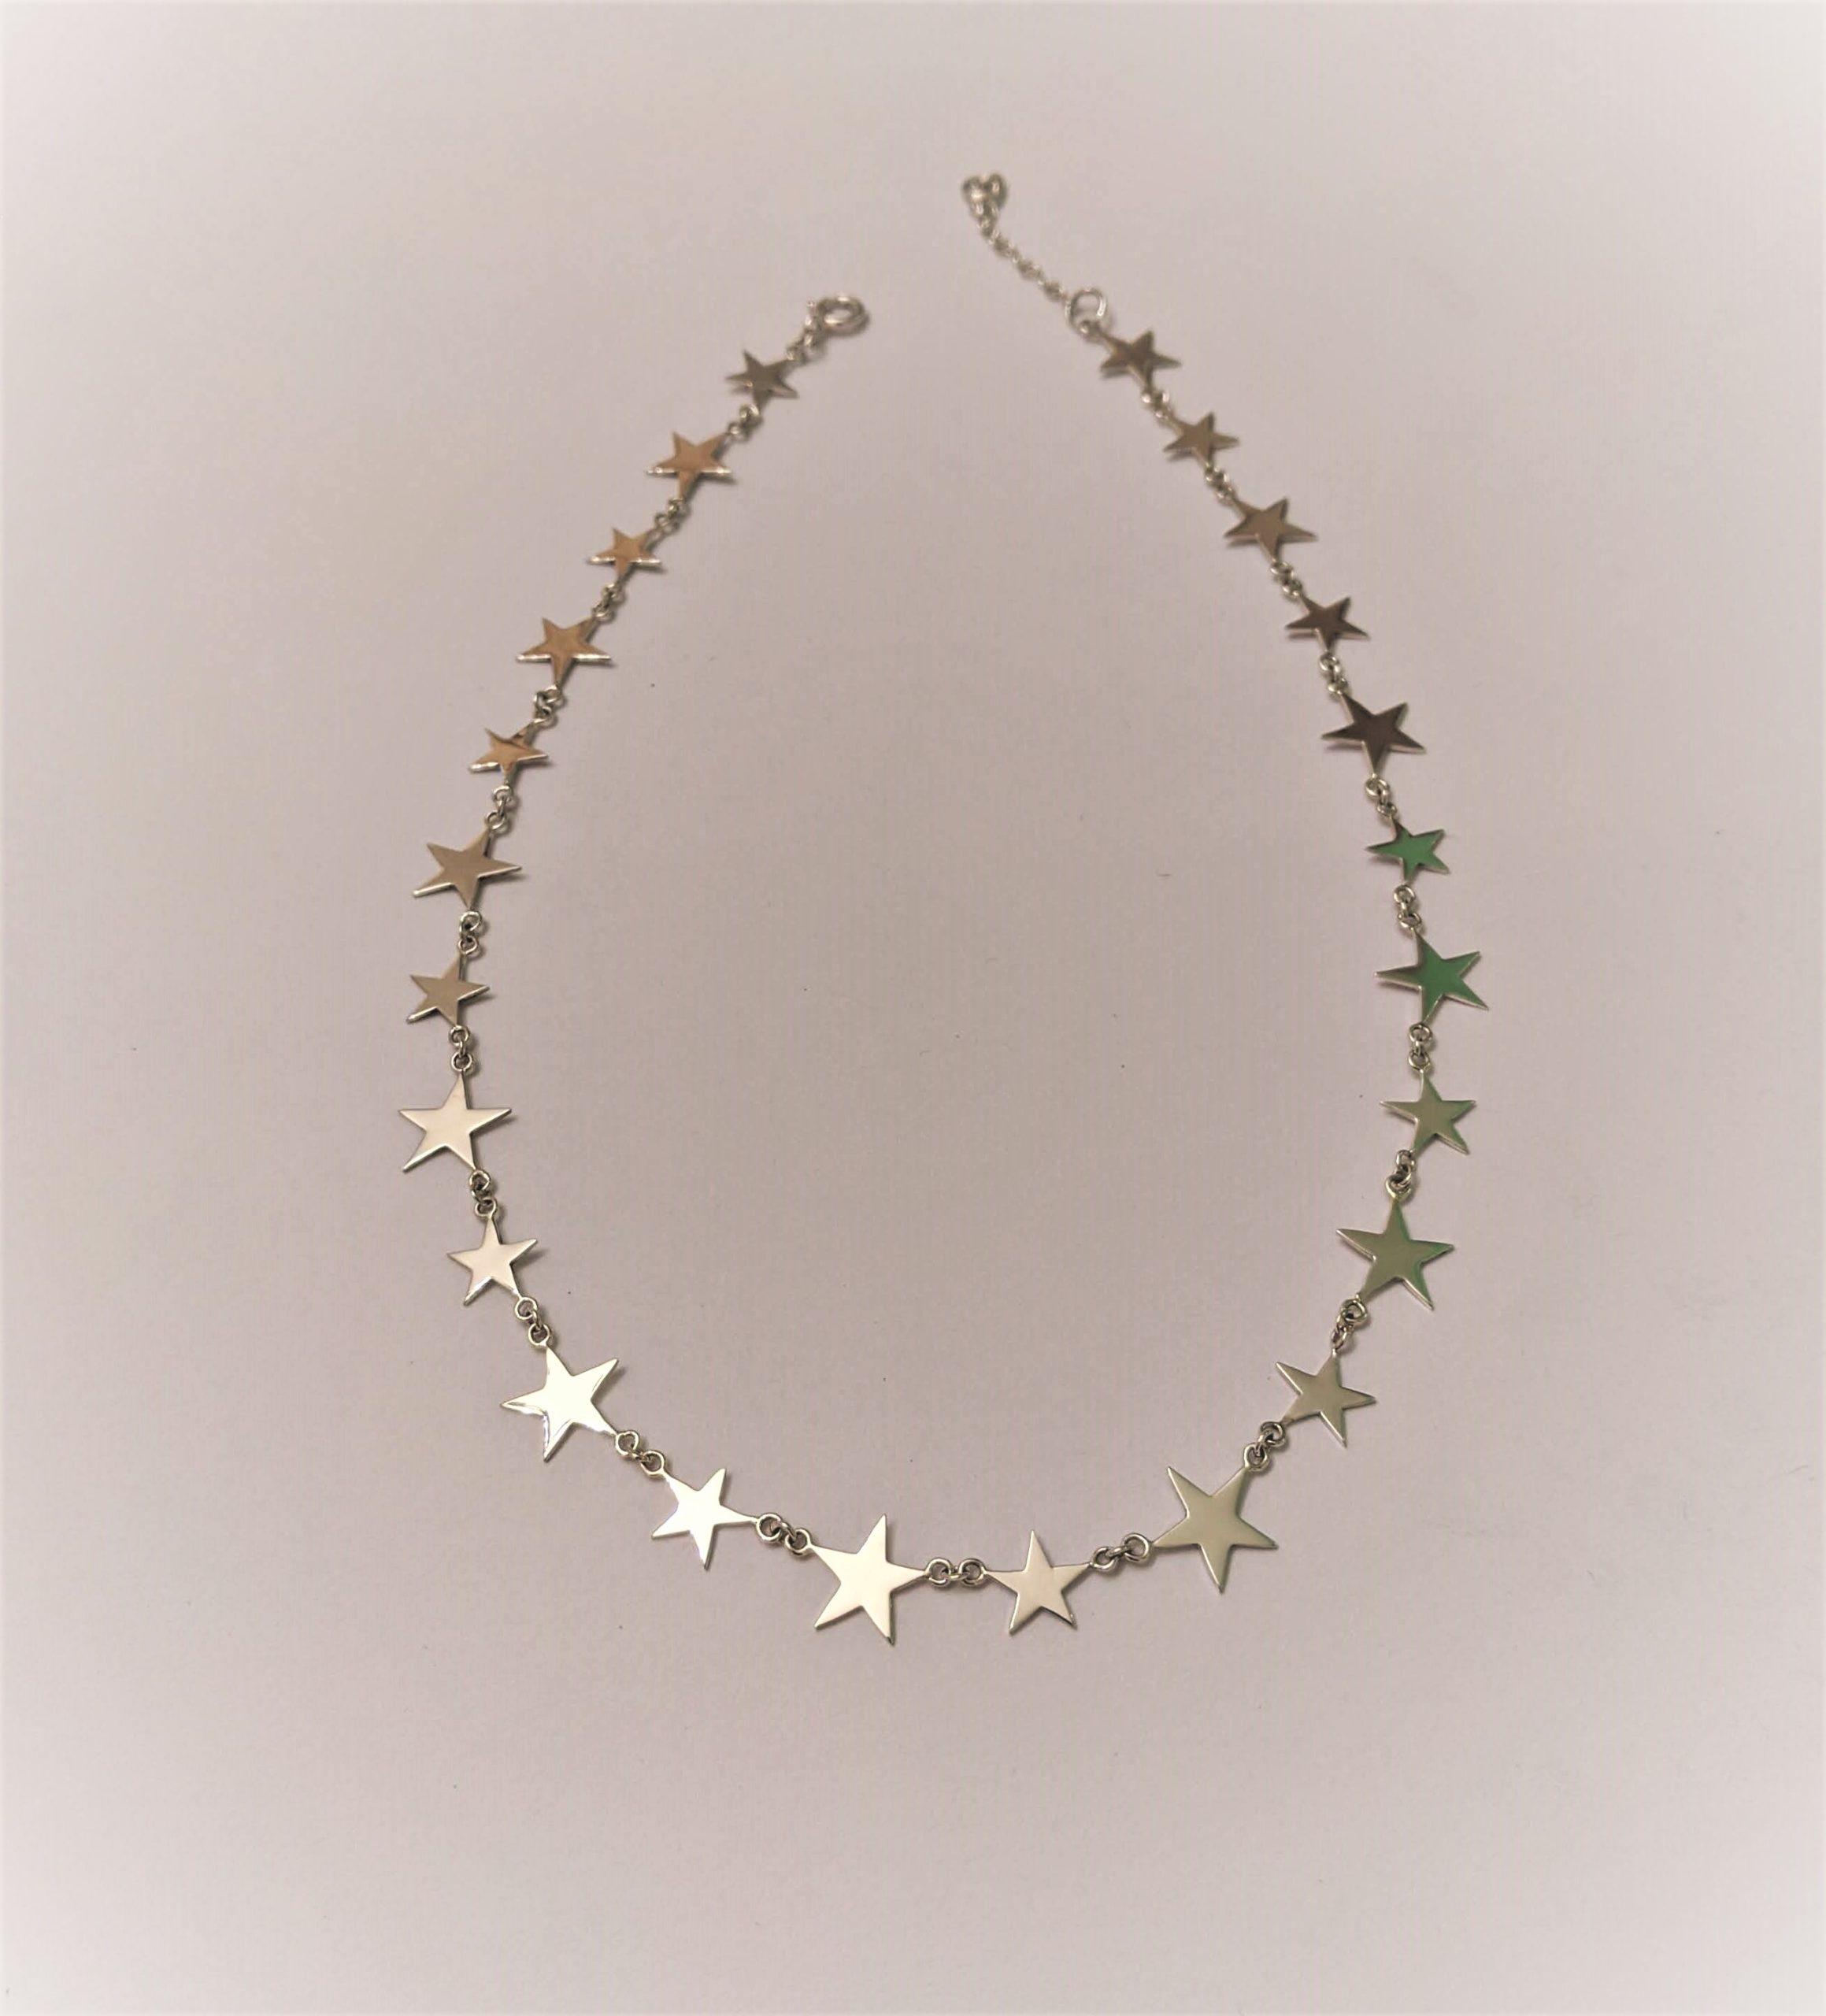 Park Road Jewellery, Bespoke Handmade Sterling Silver Graduated Star Necklace